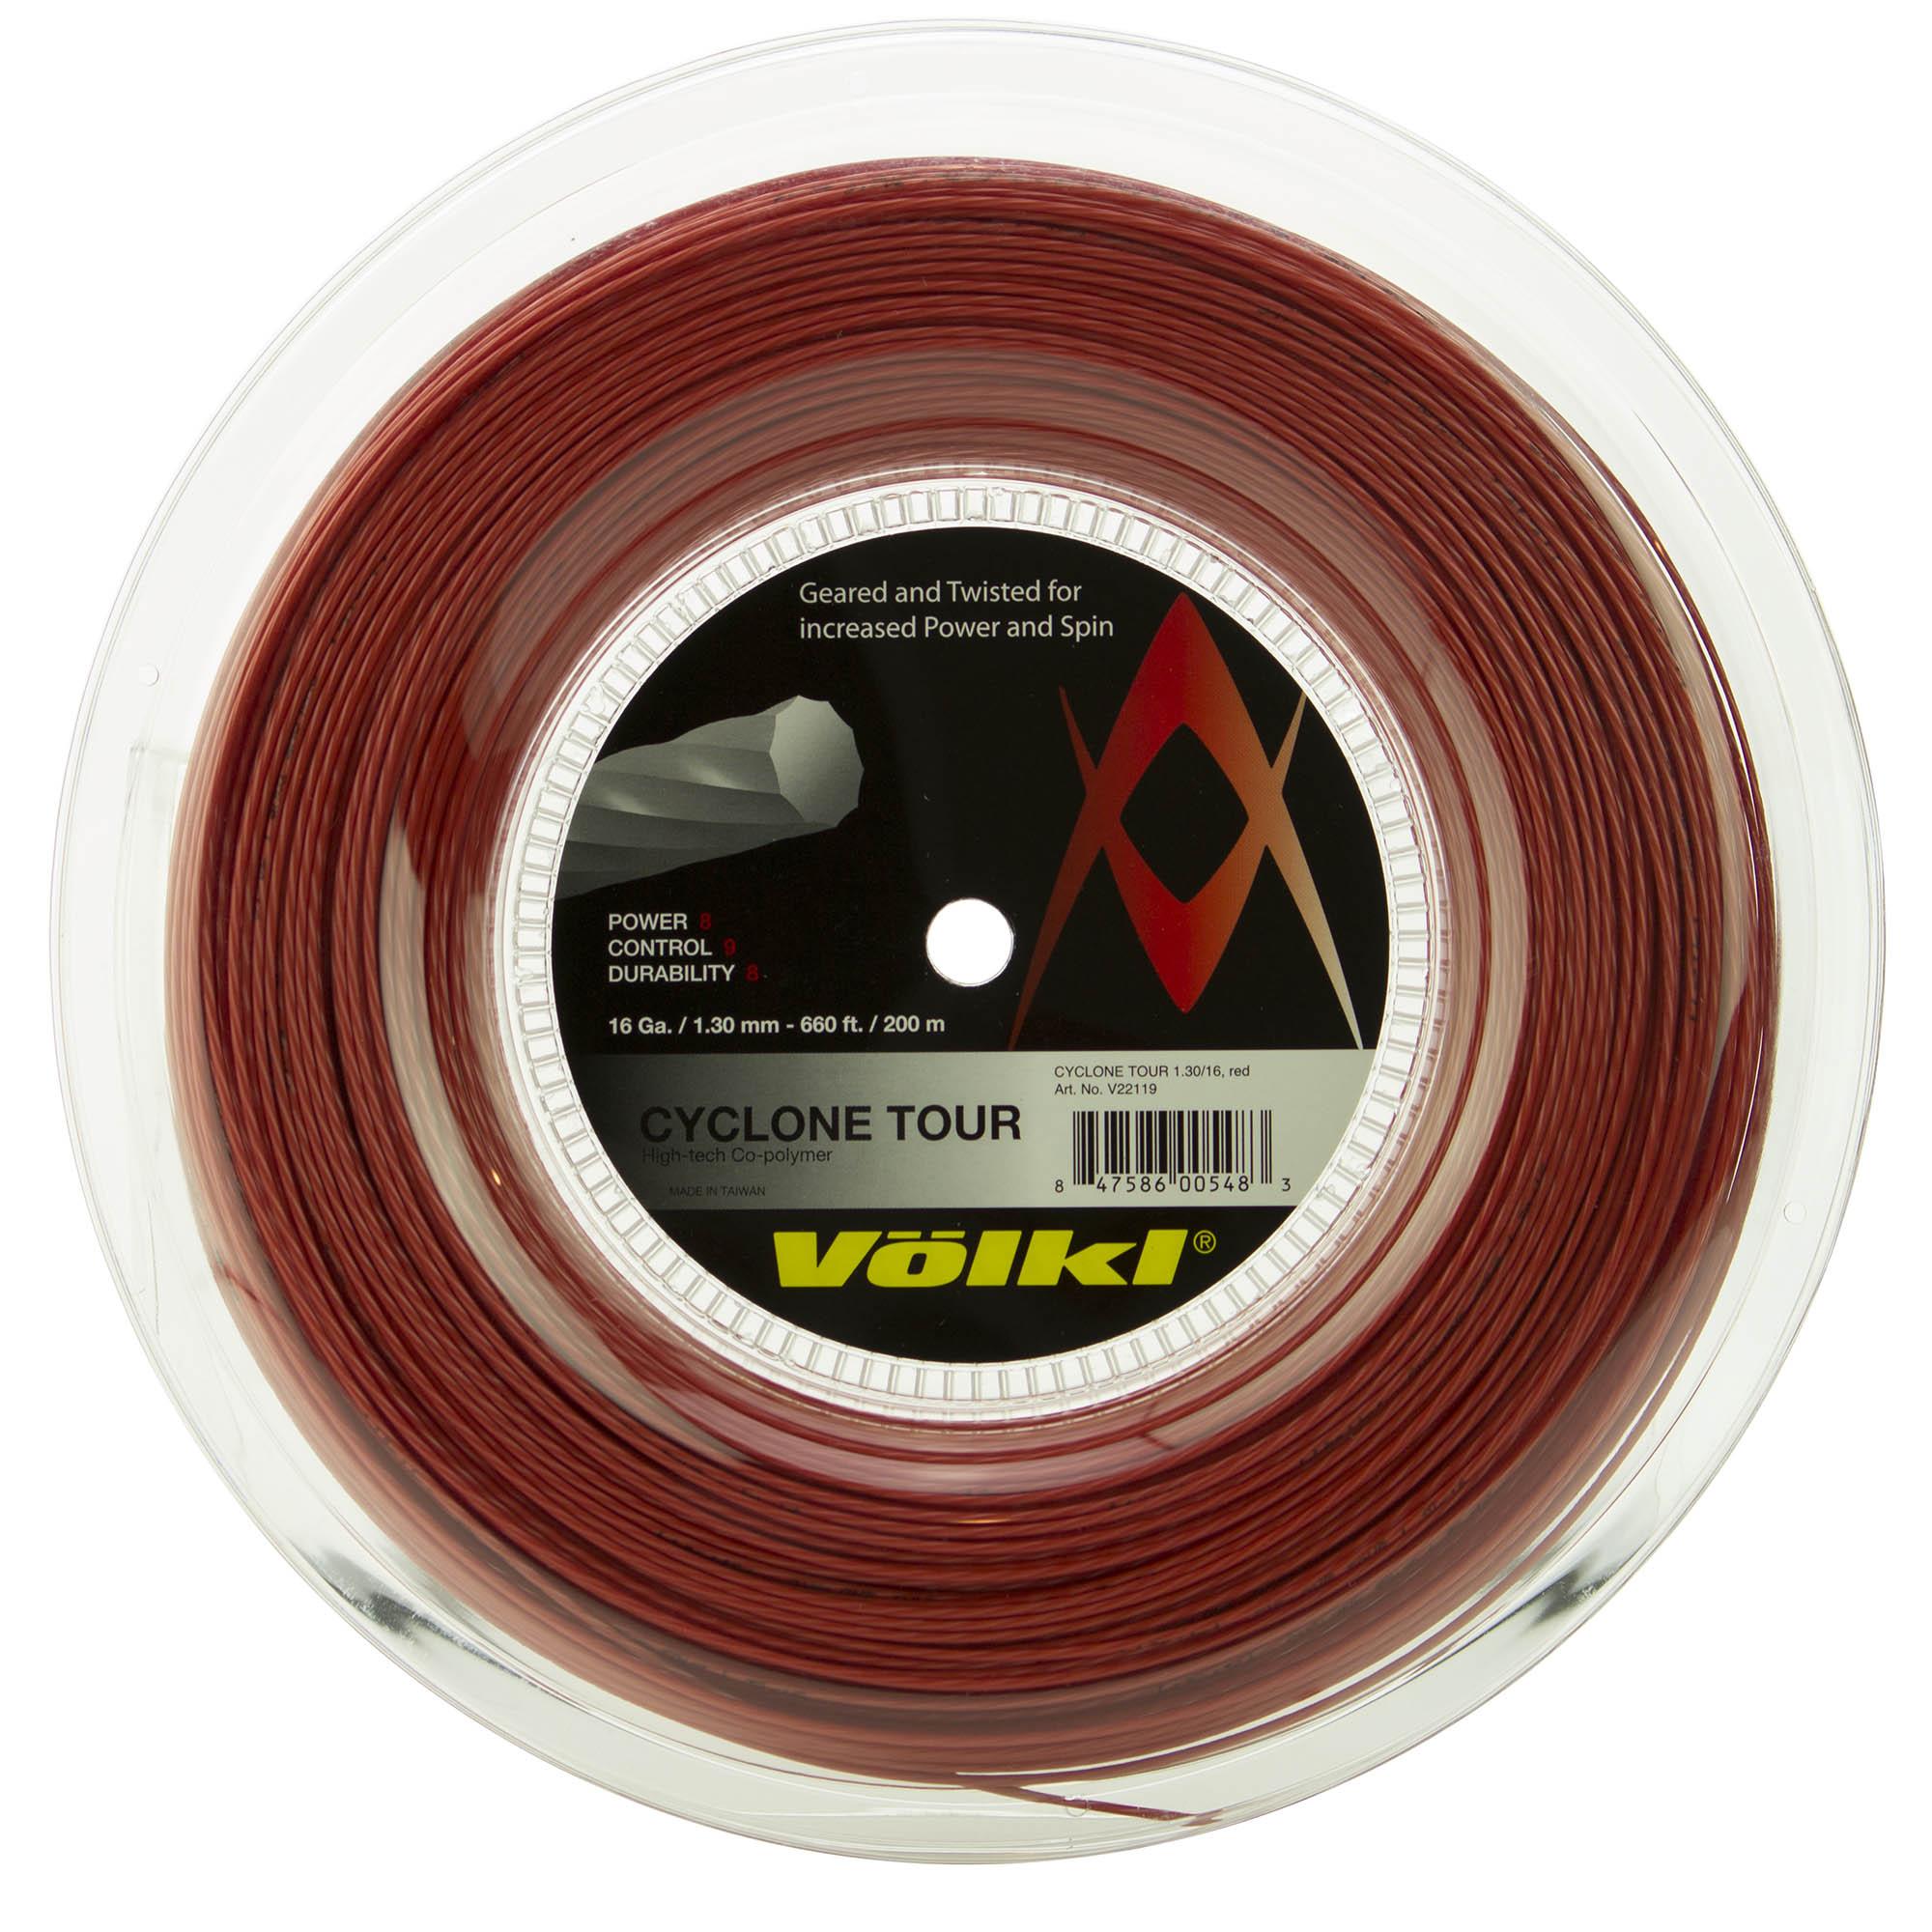 Volkl Cyclone Tour Tennis String - 200m Reel - Red, 1.20mm